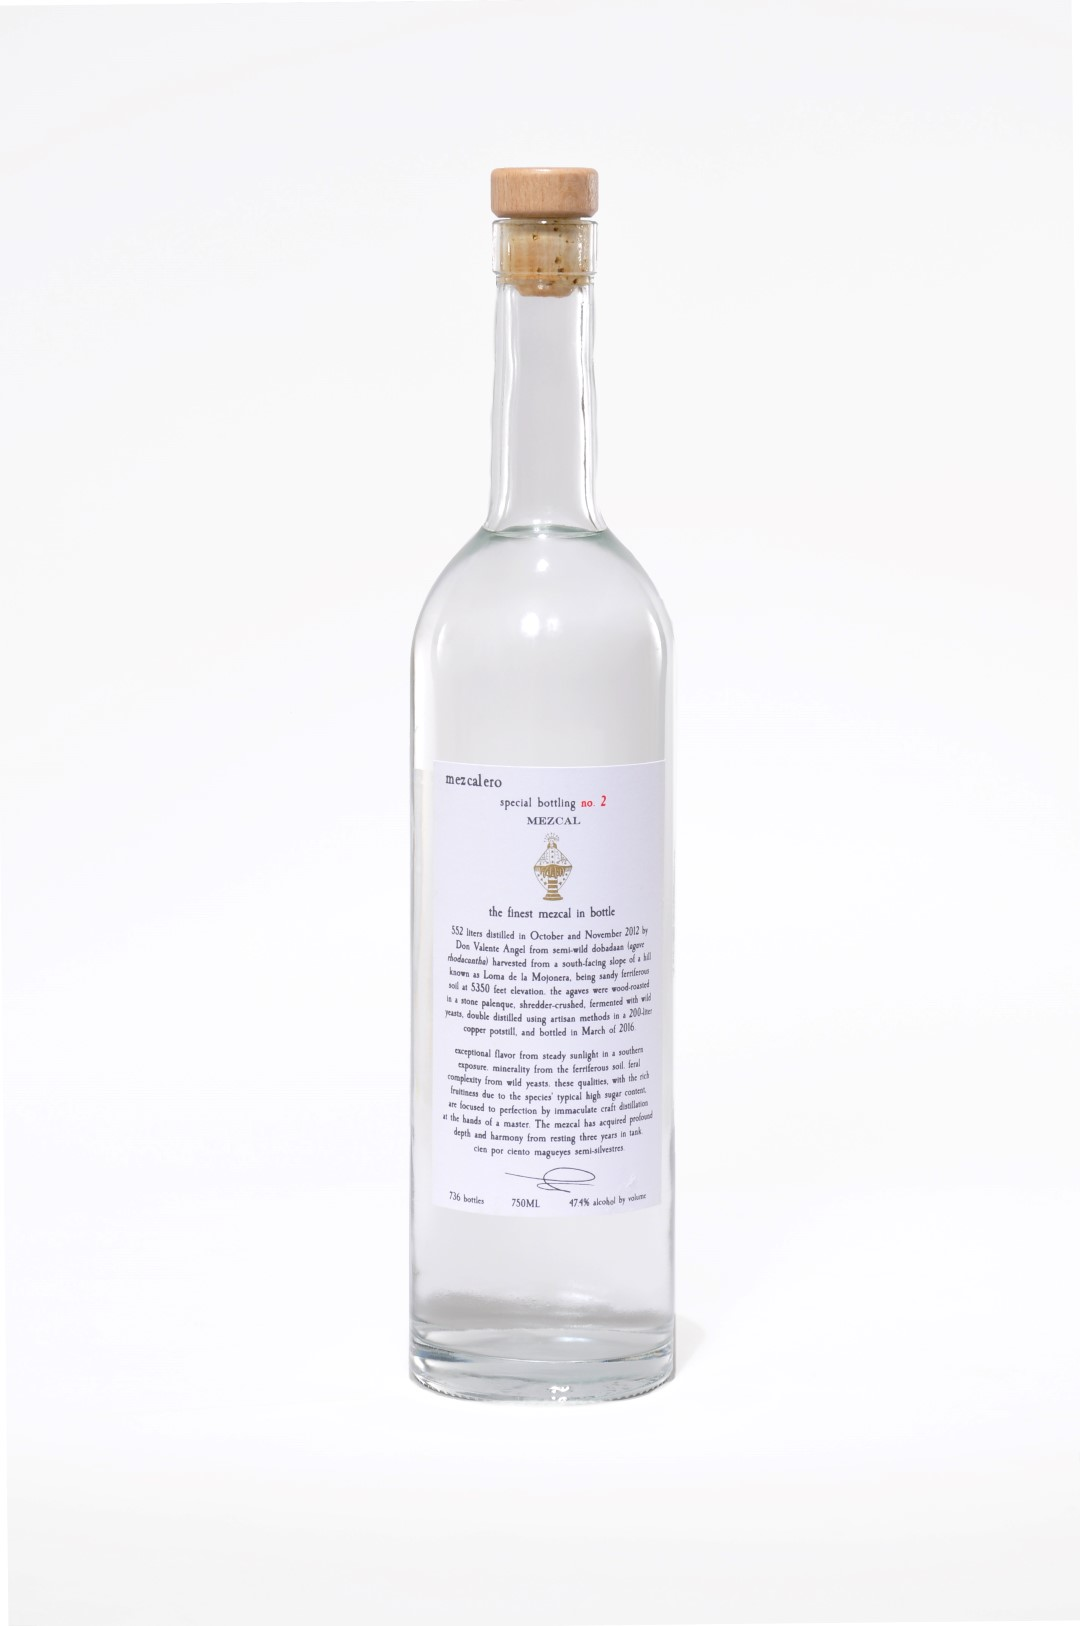 Mezcalero Special Bottling Release #2